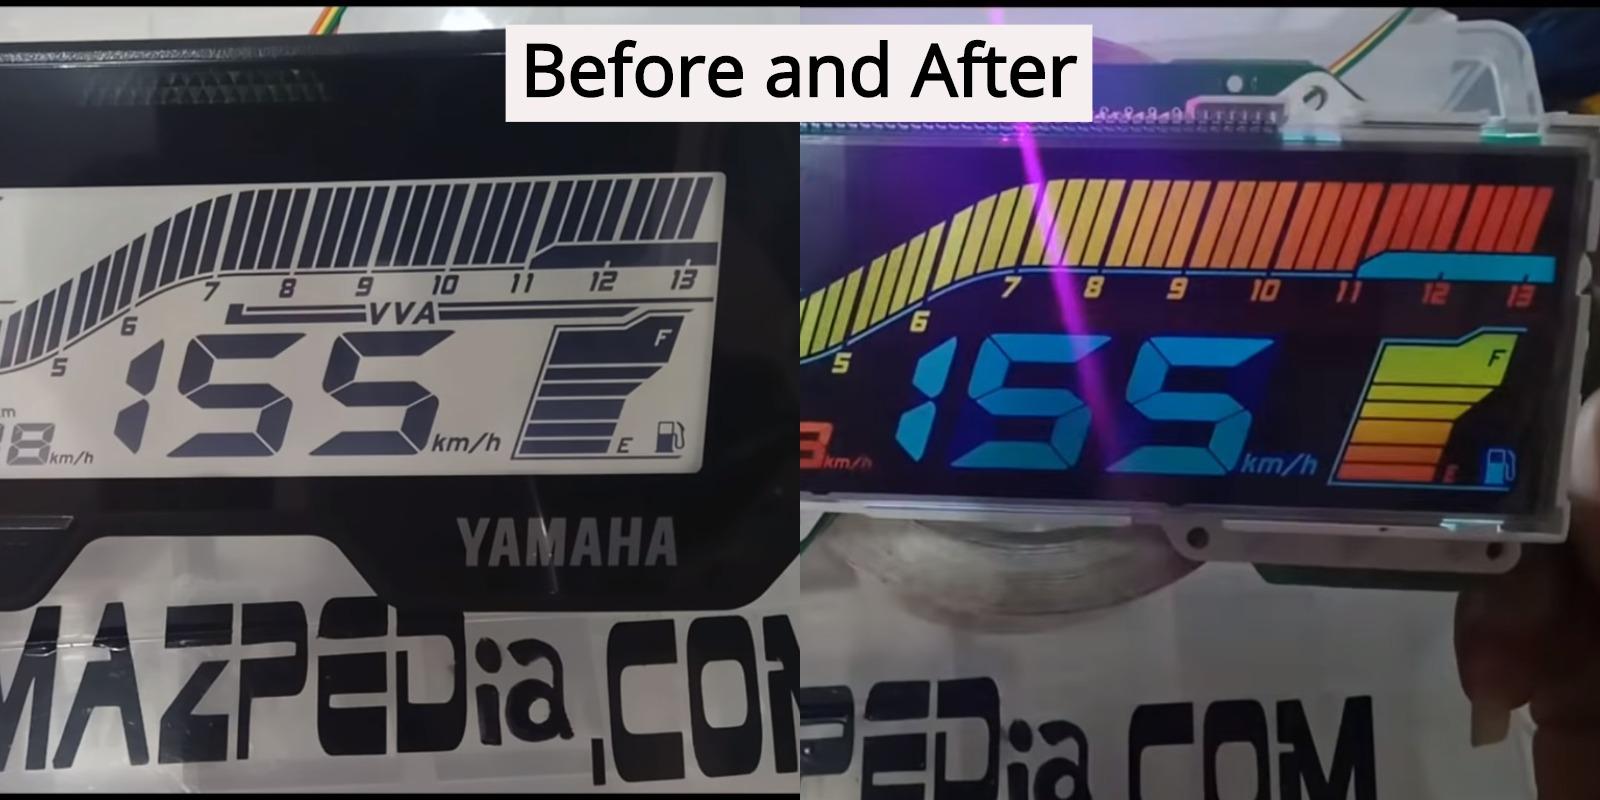 Standard Yamaha R15 V3 0 display modified to colour [Video]